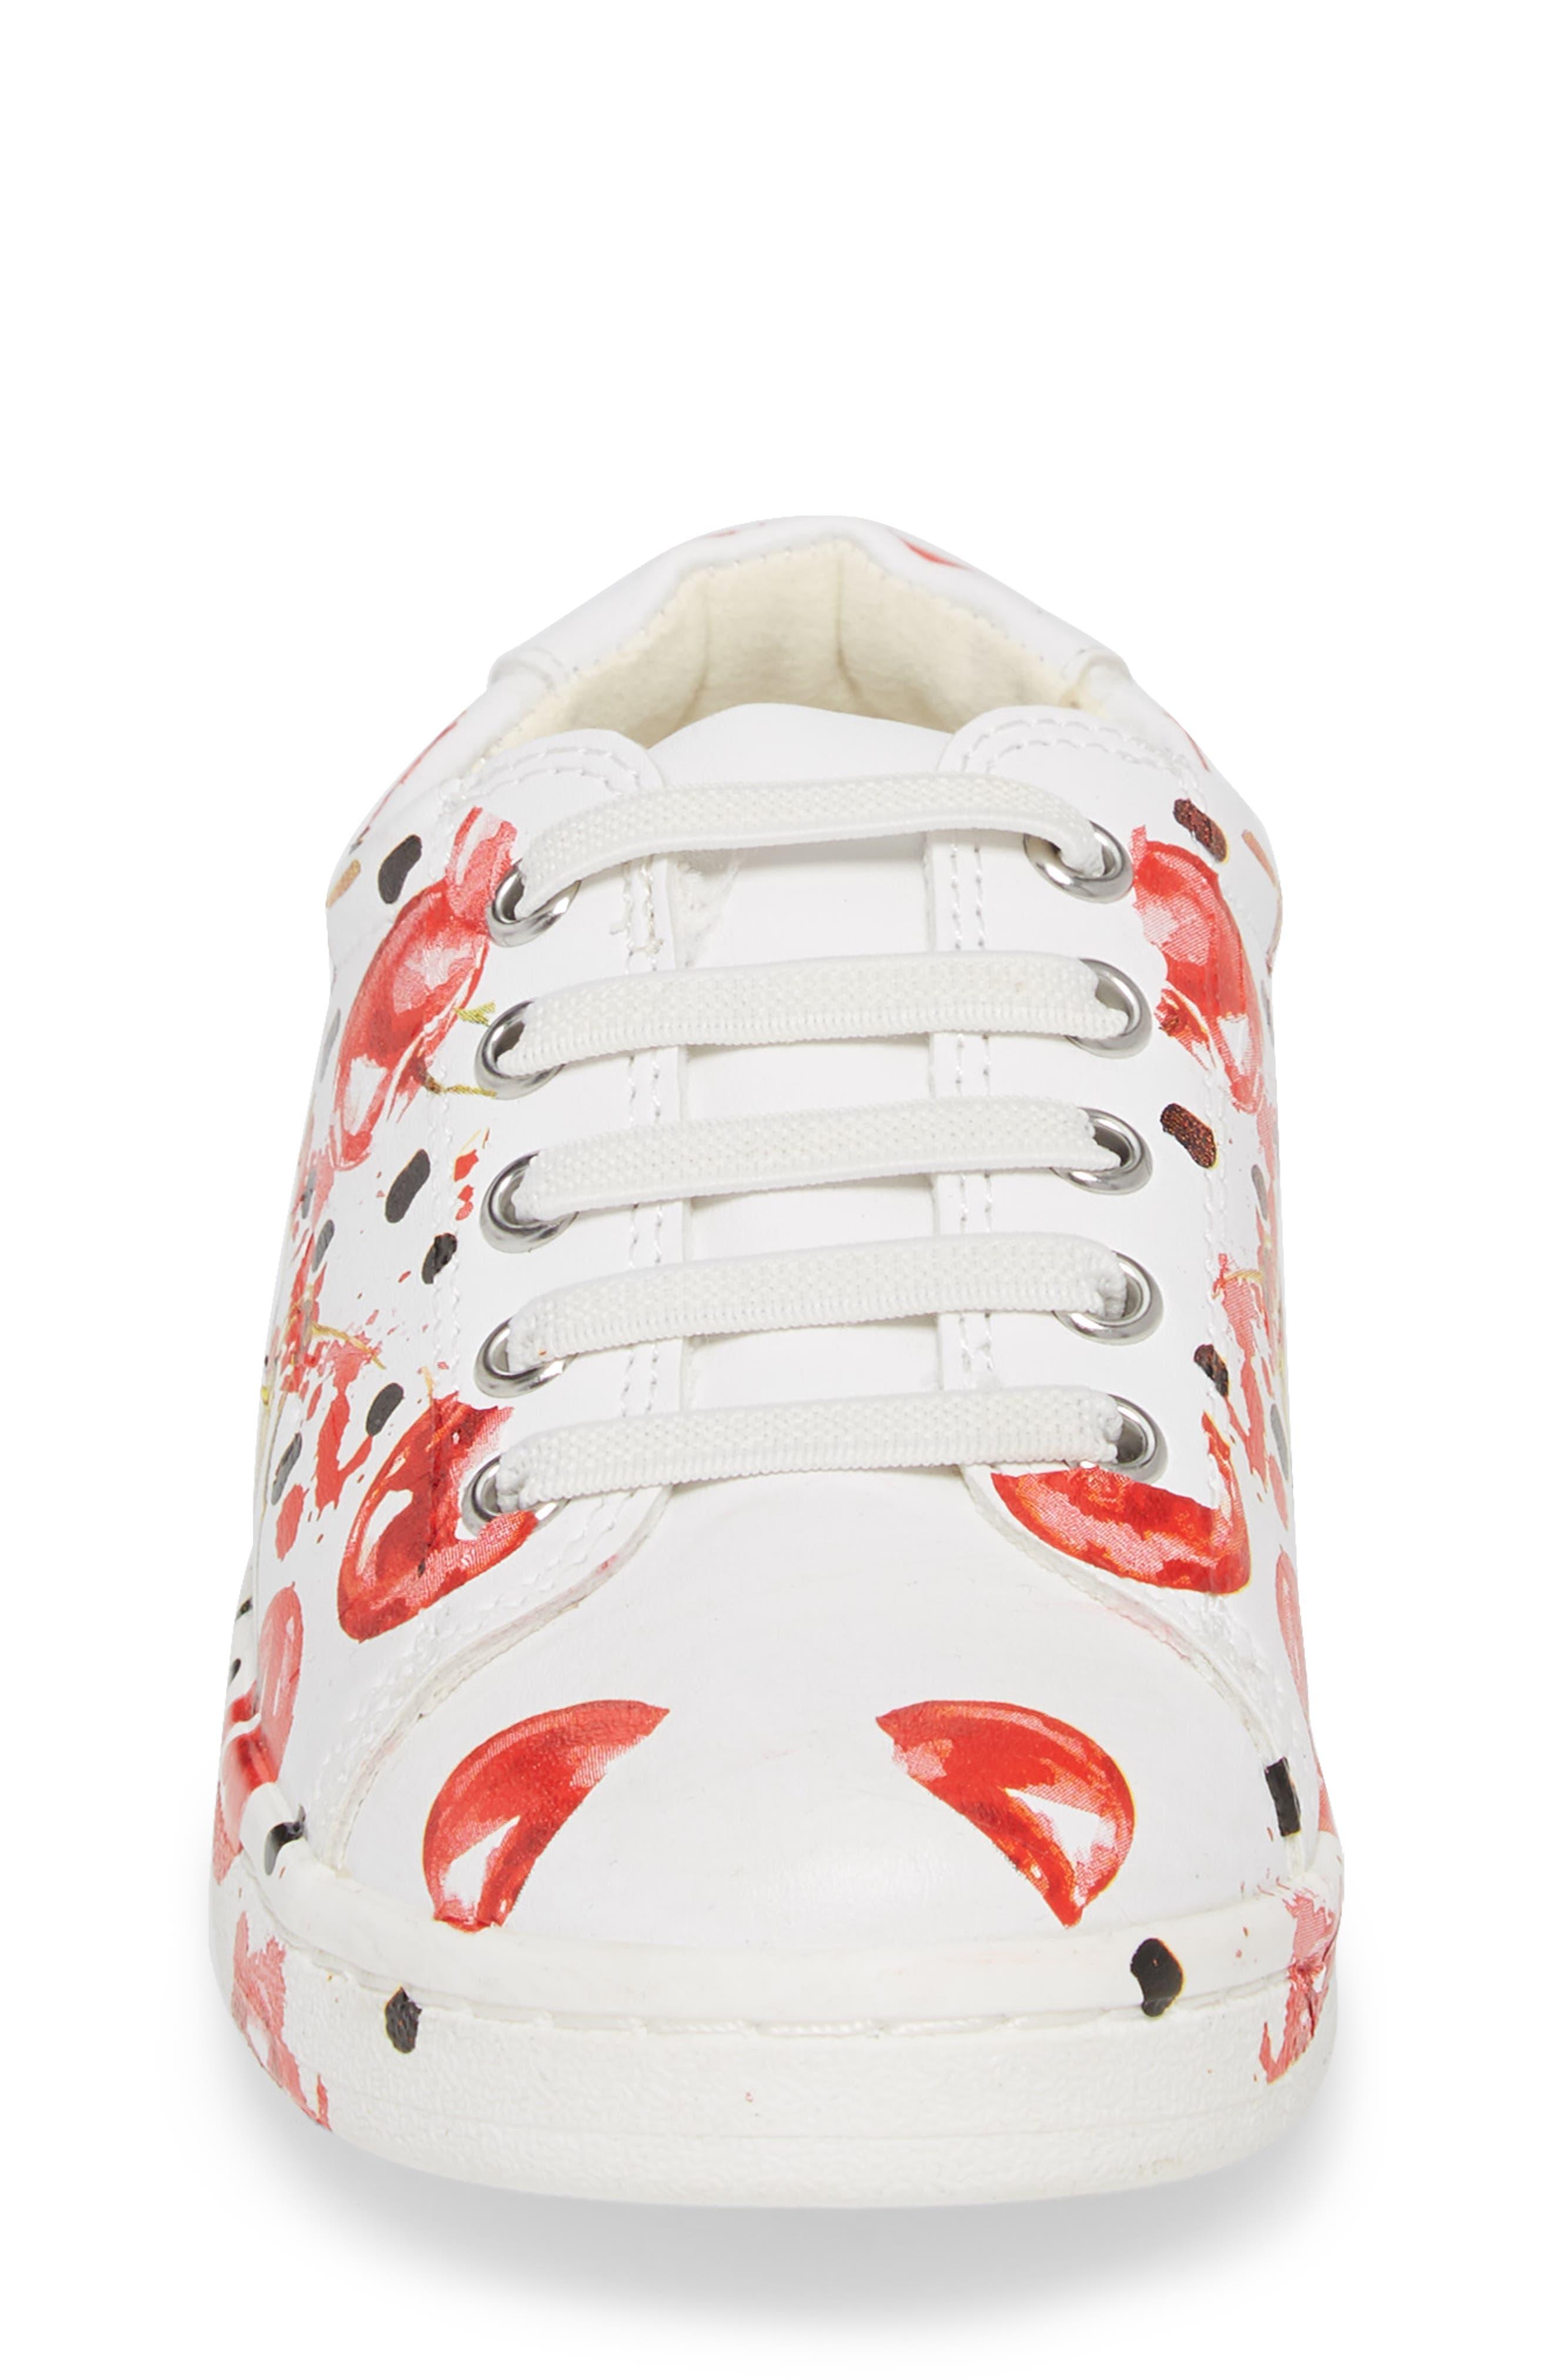 Blane Milford Fruit Print Sneaker,                             Alternate thumbnail 4, color,                             White/ Cherry Faux Leather